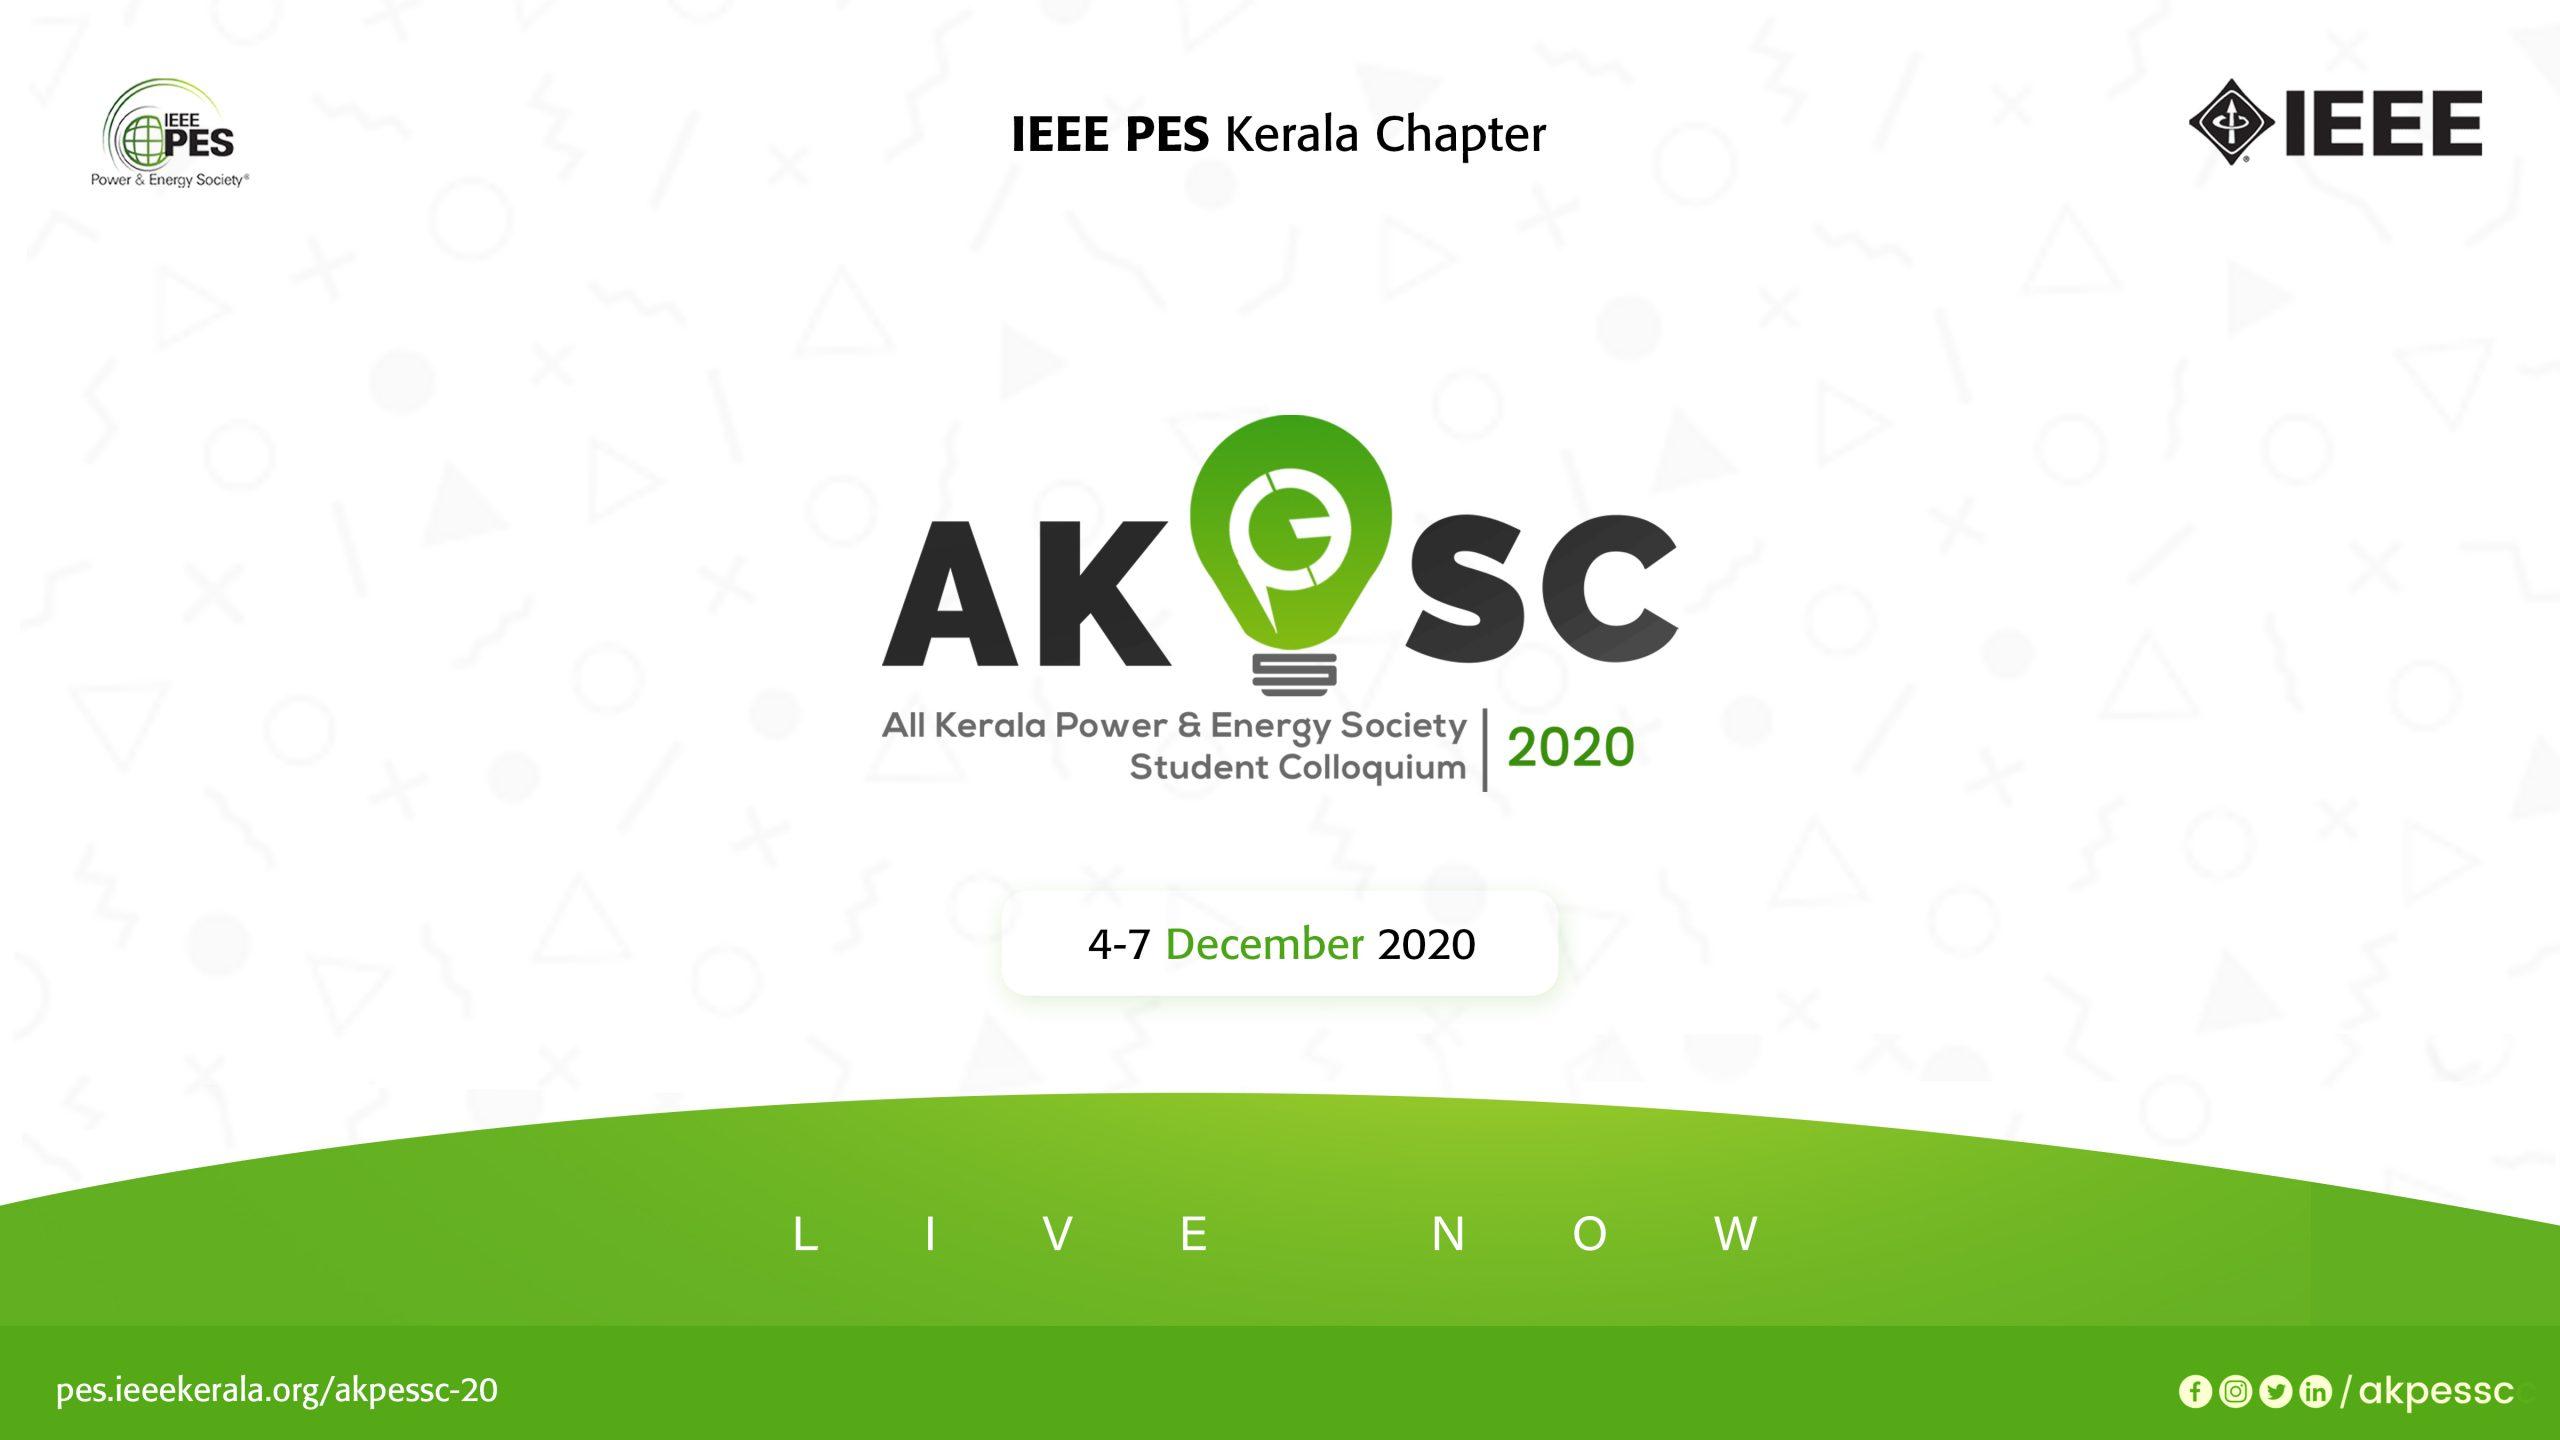 AKPESSC 20